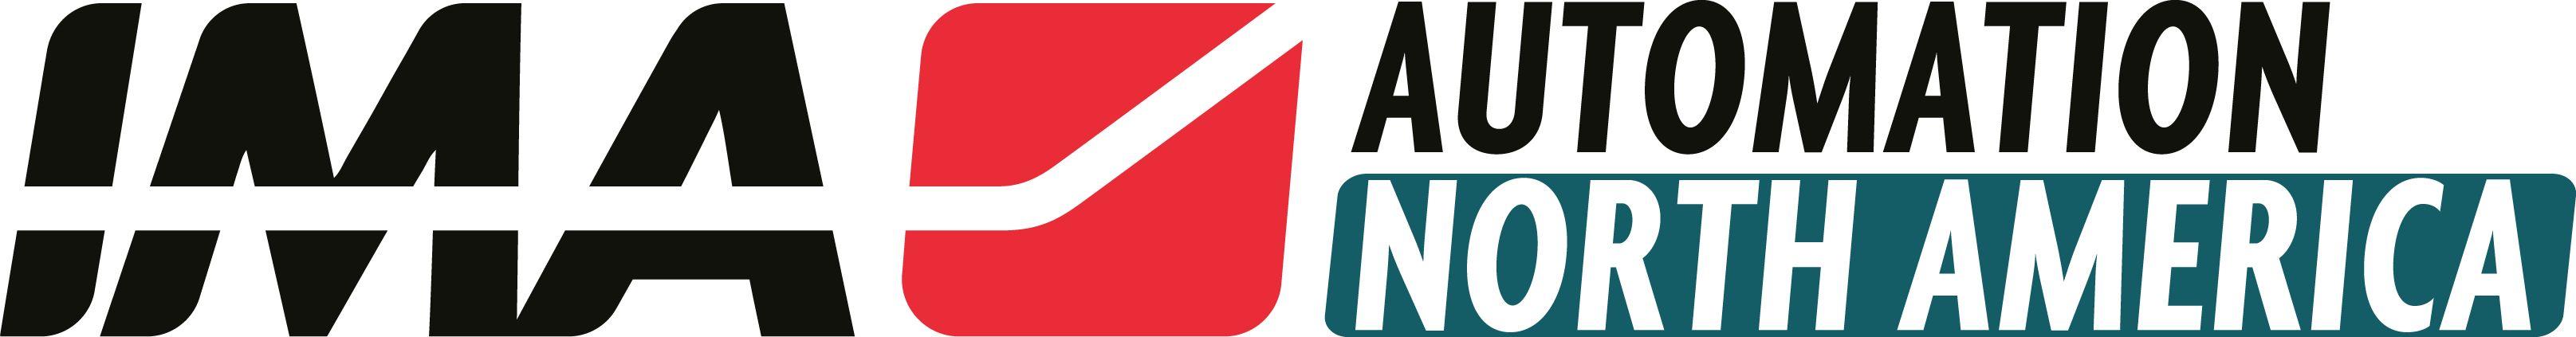 LogoIMA_AUTOMATION_NorthAmerica